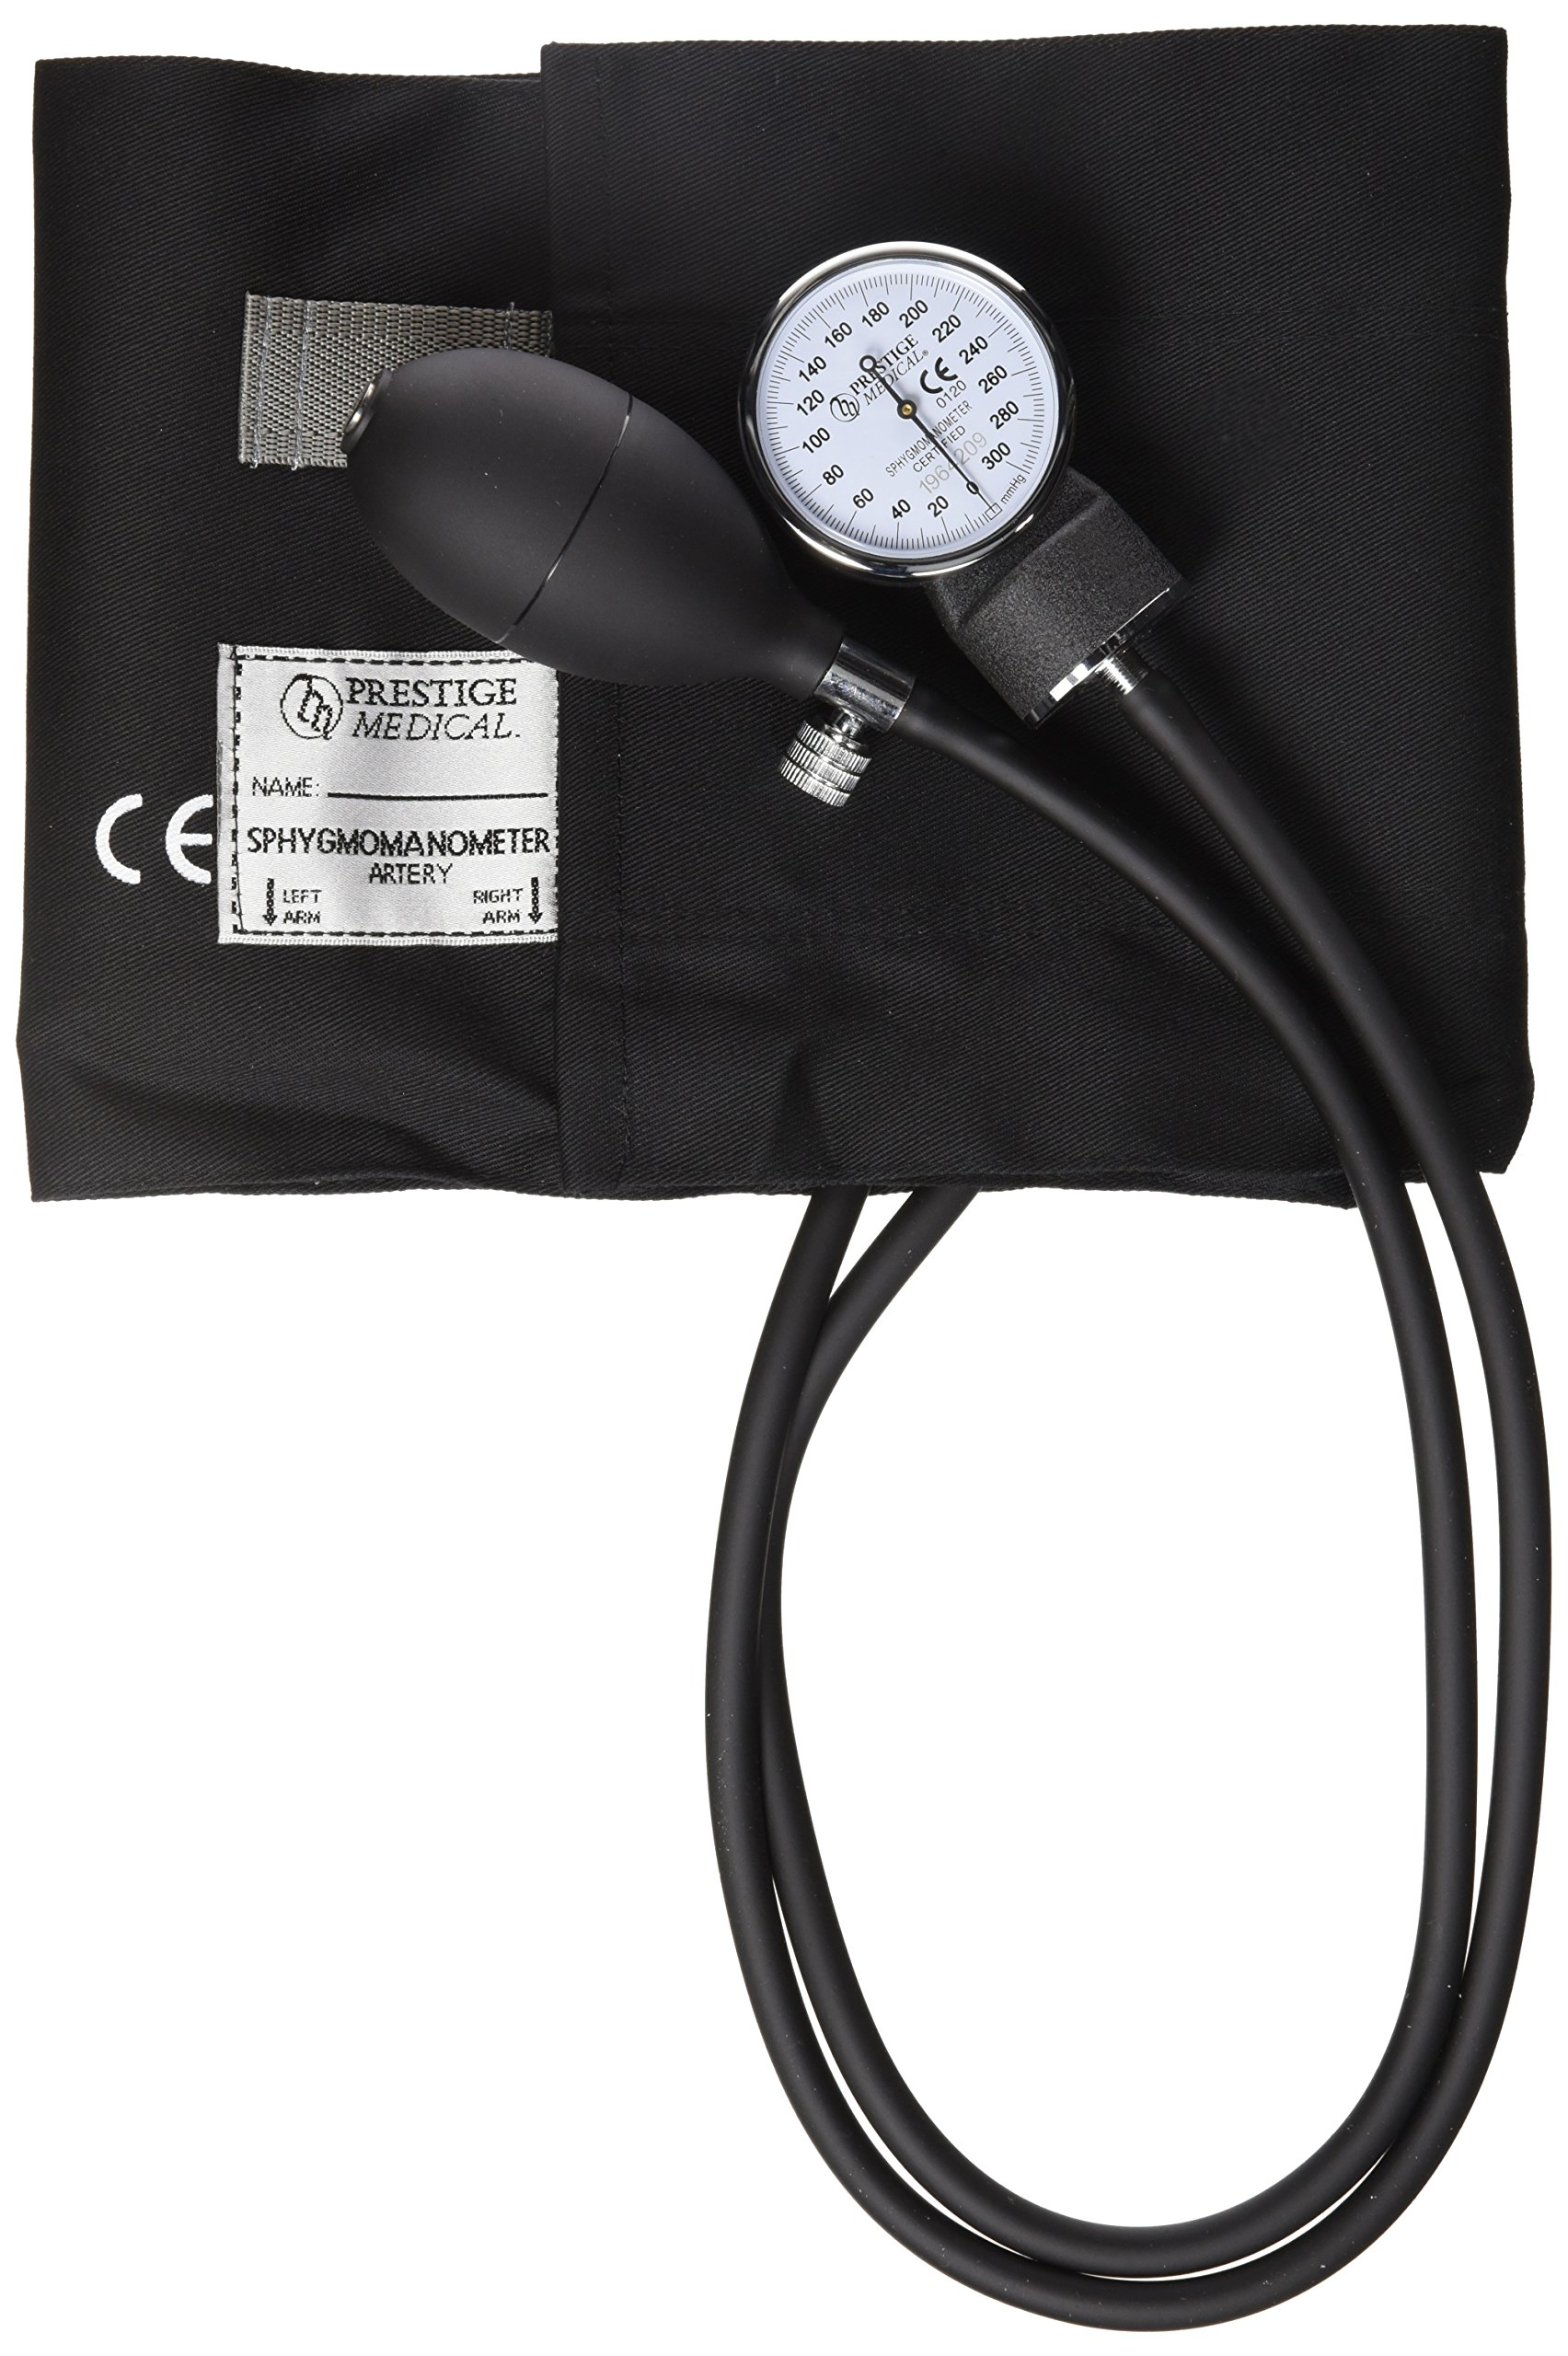 Prestige Medical Adult Cotton Cuff Aneroid Sphygmomanometer, Large, 11.6 Ounce